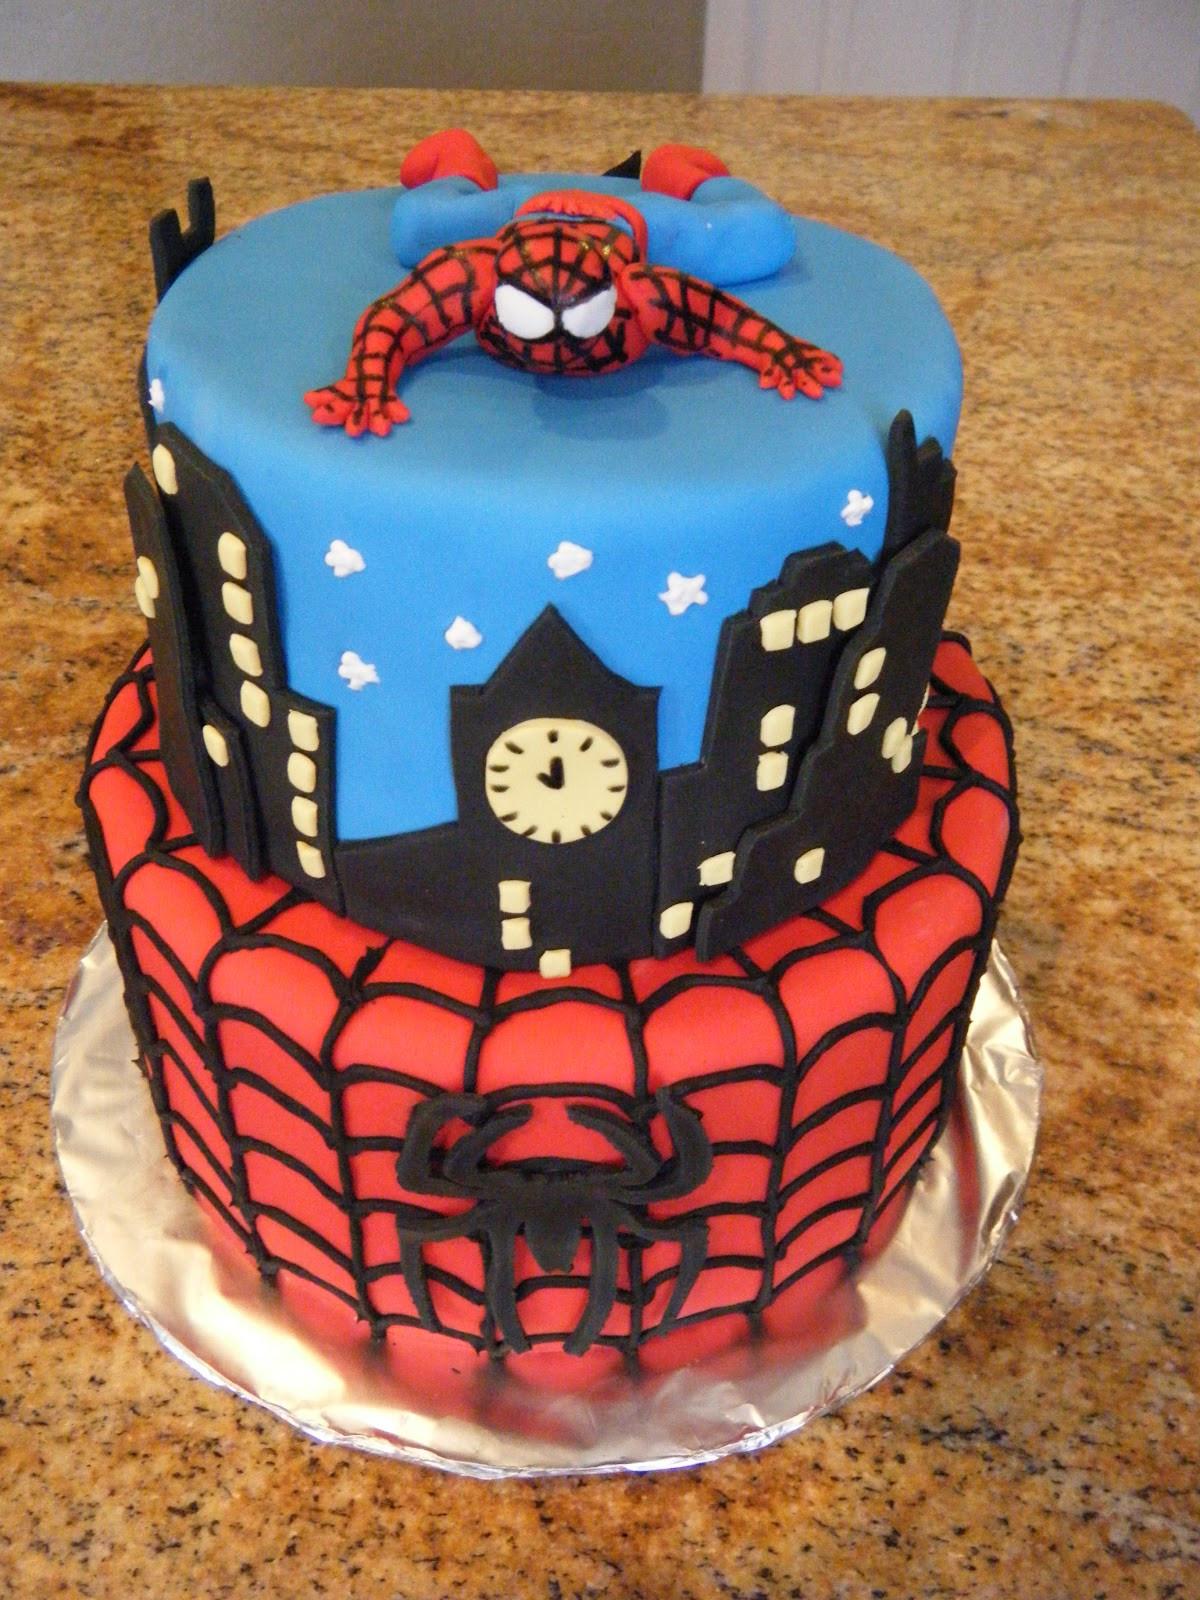 Spiderman Birthday Cakes  Cassy s Cakes Spiderman Cake